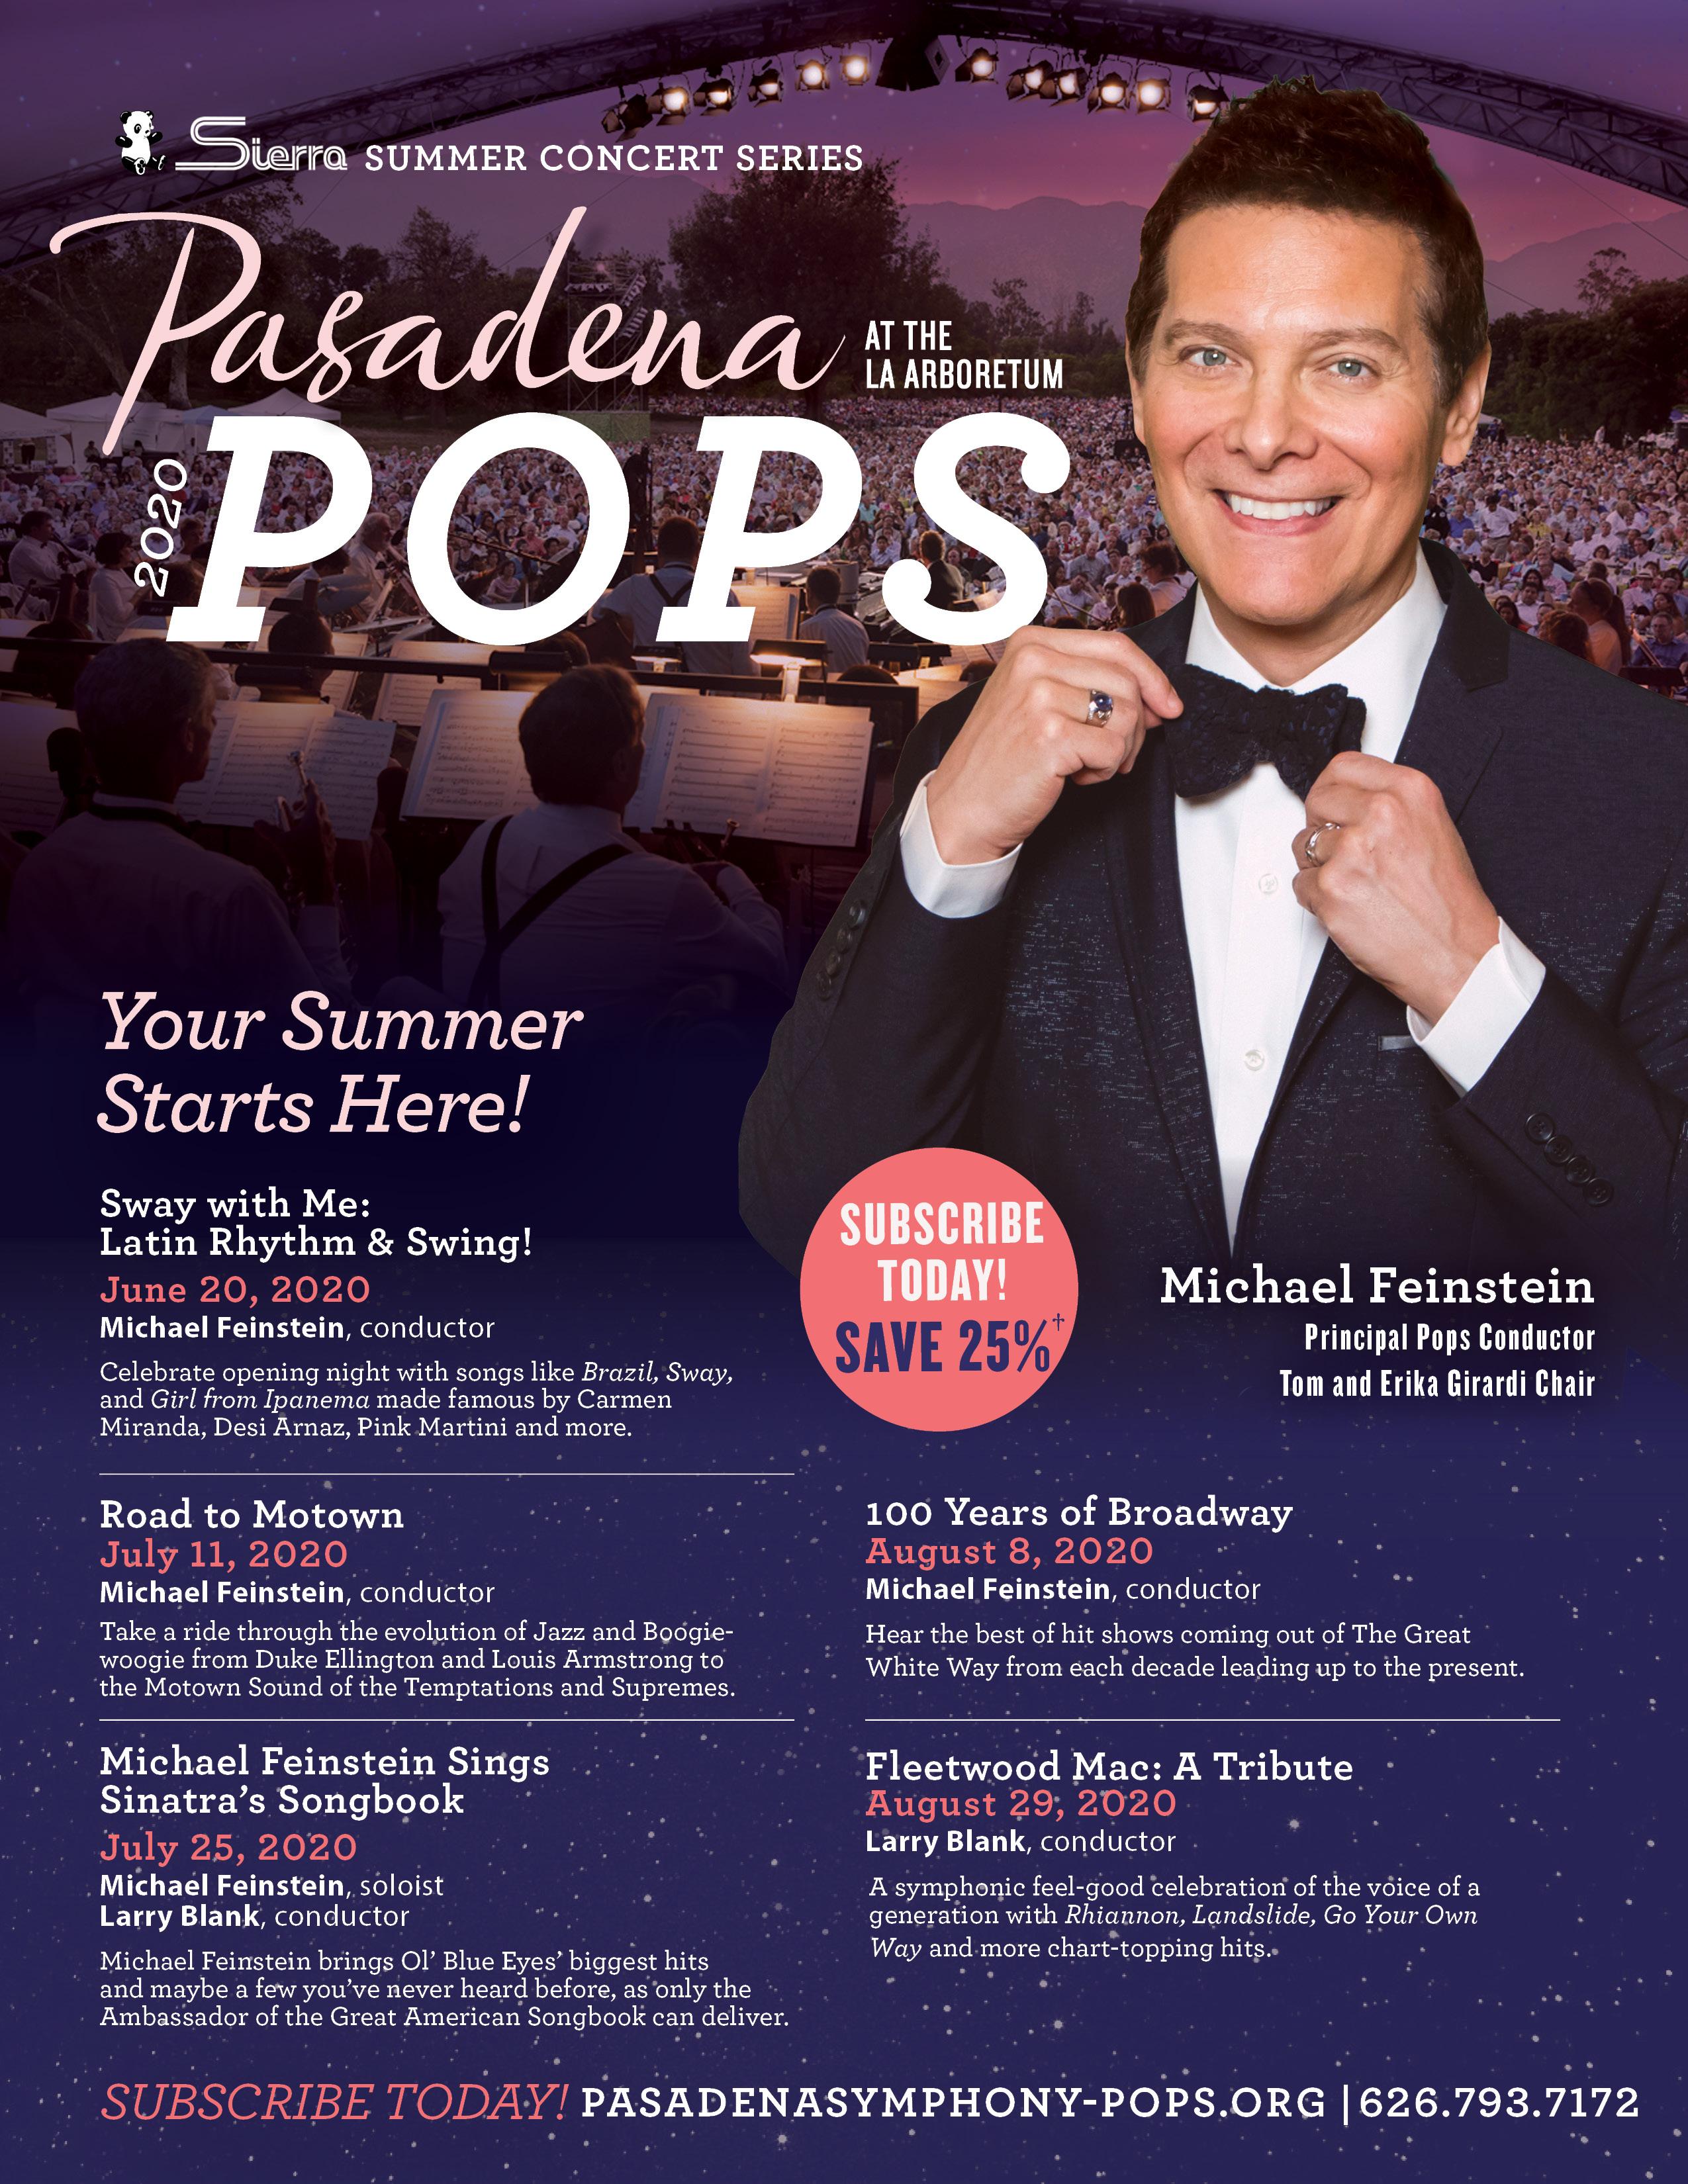 Best Summer Concerts 2020 2019 Sierra Summer Pops Series